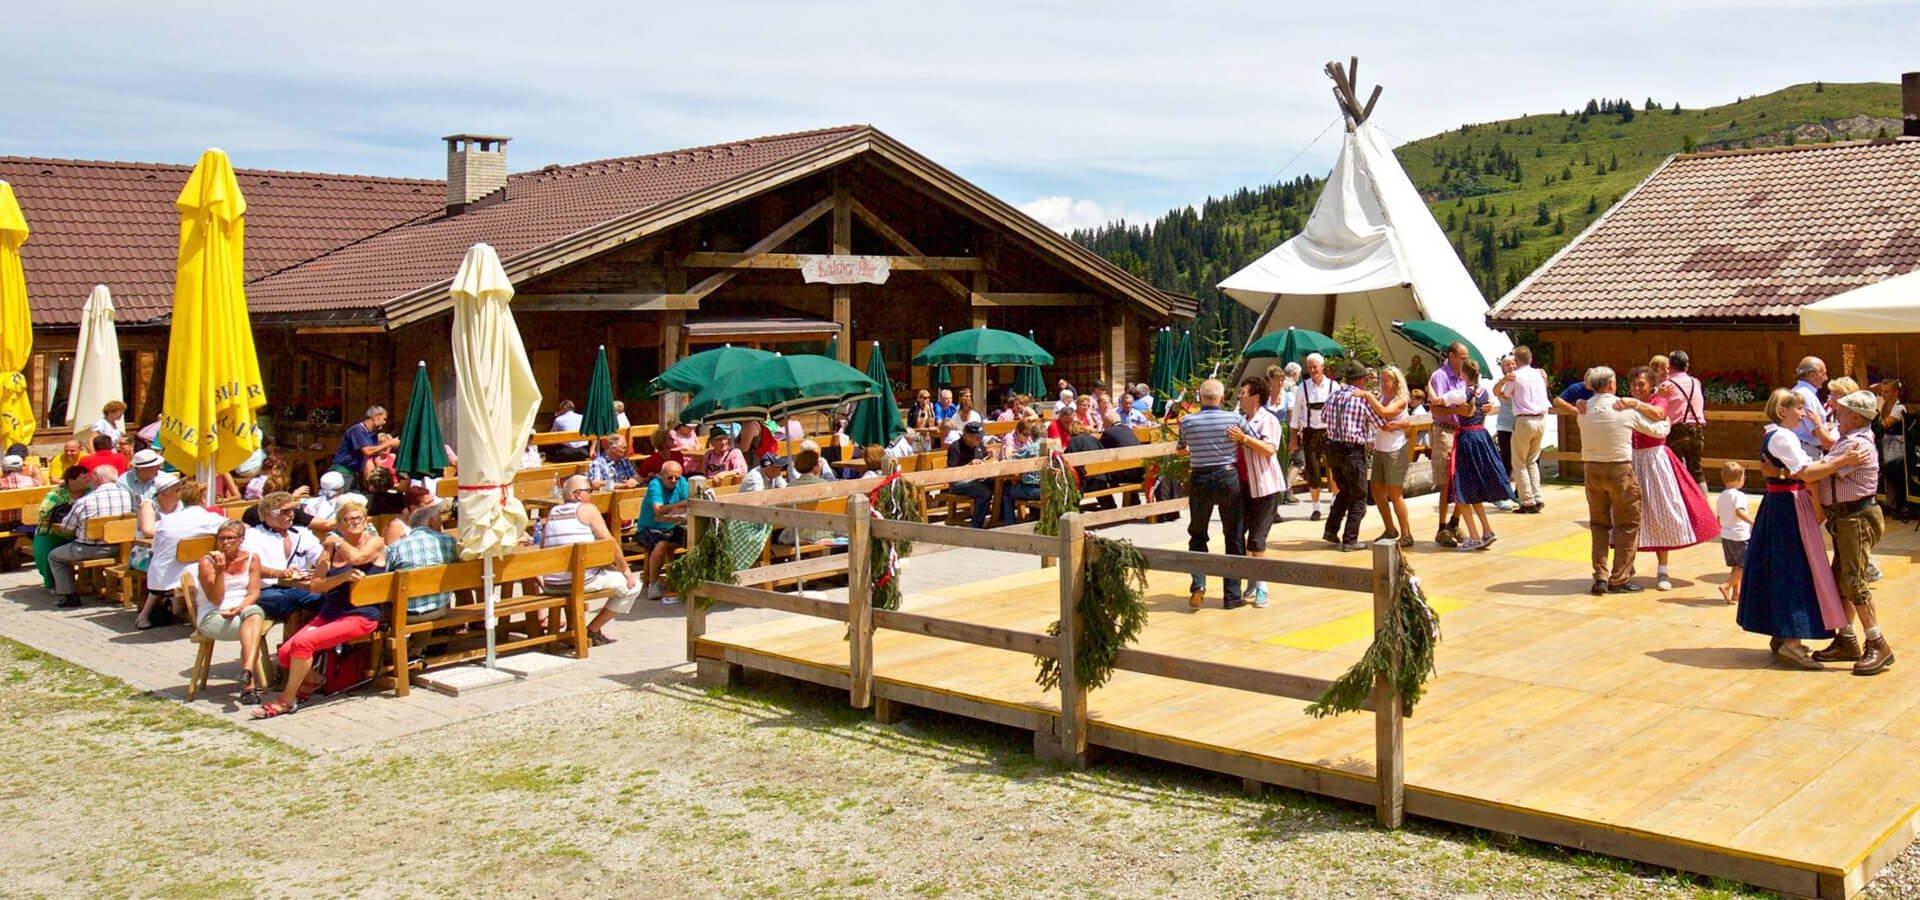 Kalcheralm-Skihuette-Ratschings-Almhuette-Suedtirol